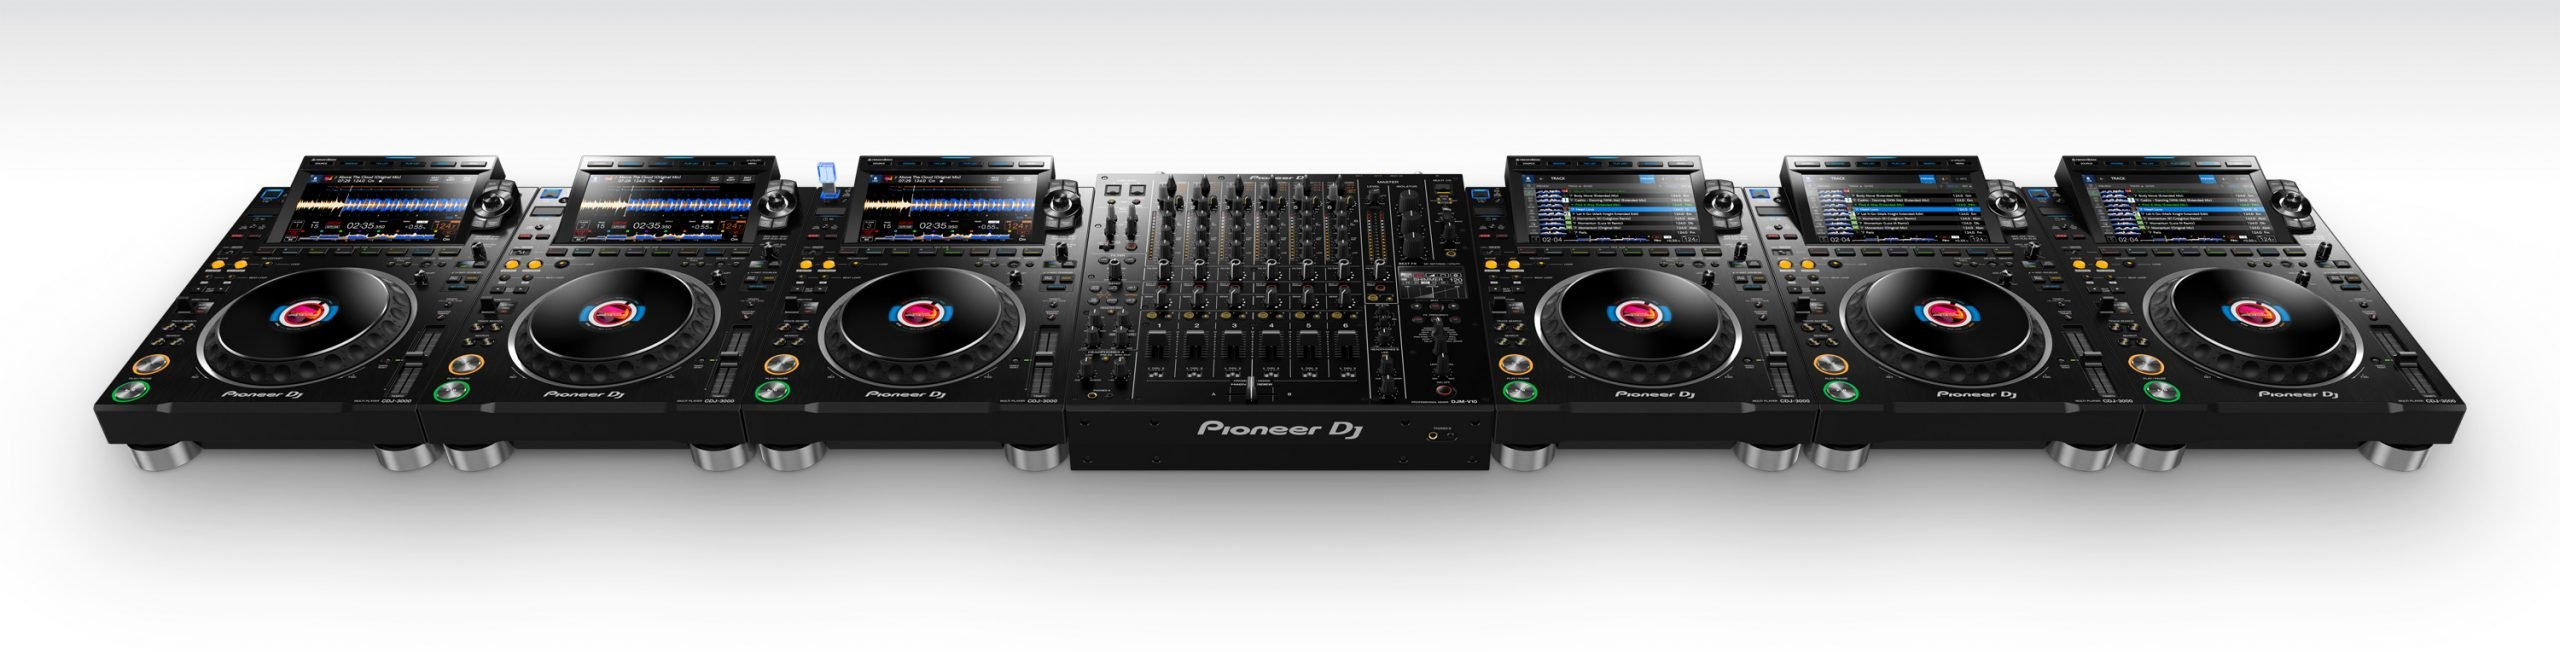 Pioneer DJ CDJ-3000 media player launch (4)